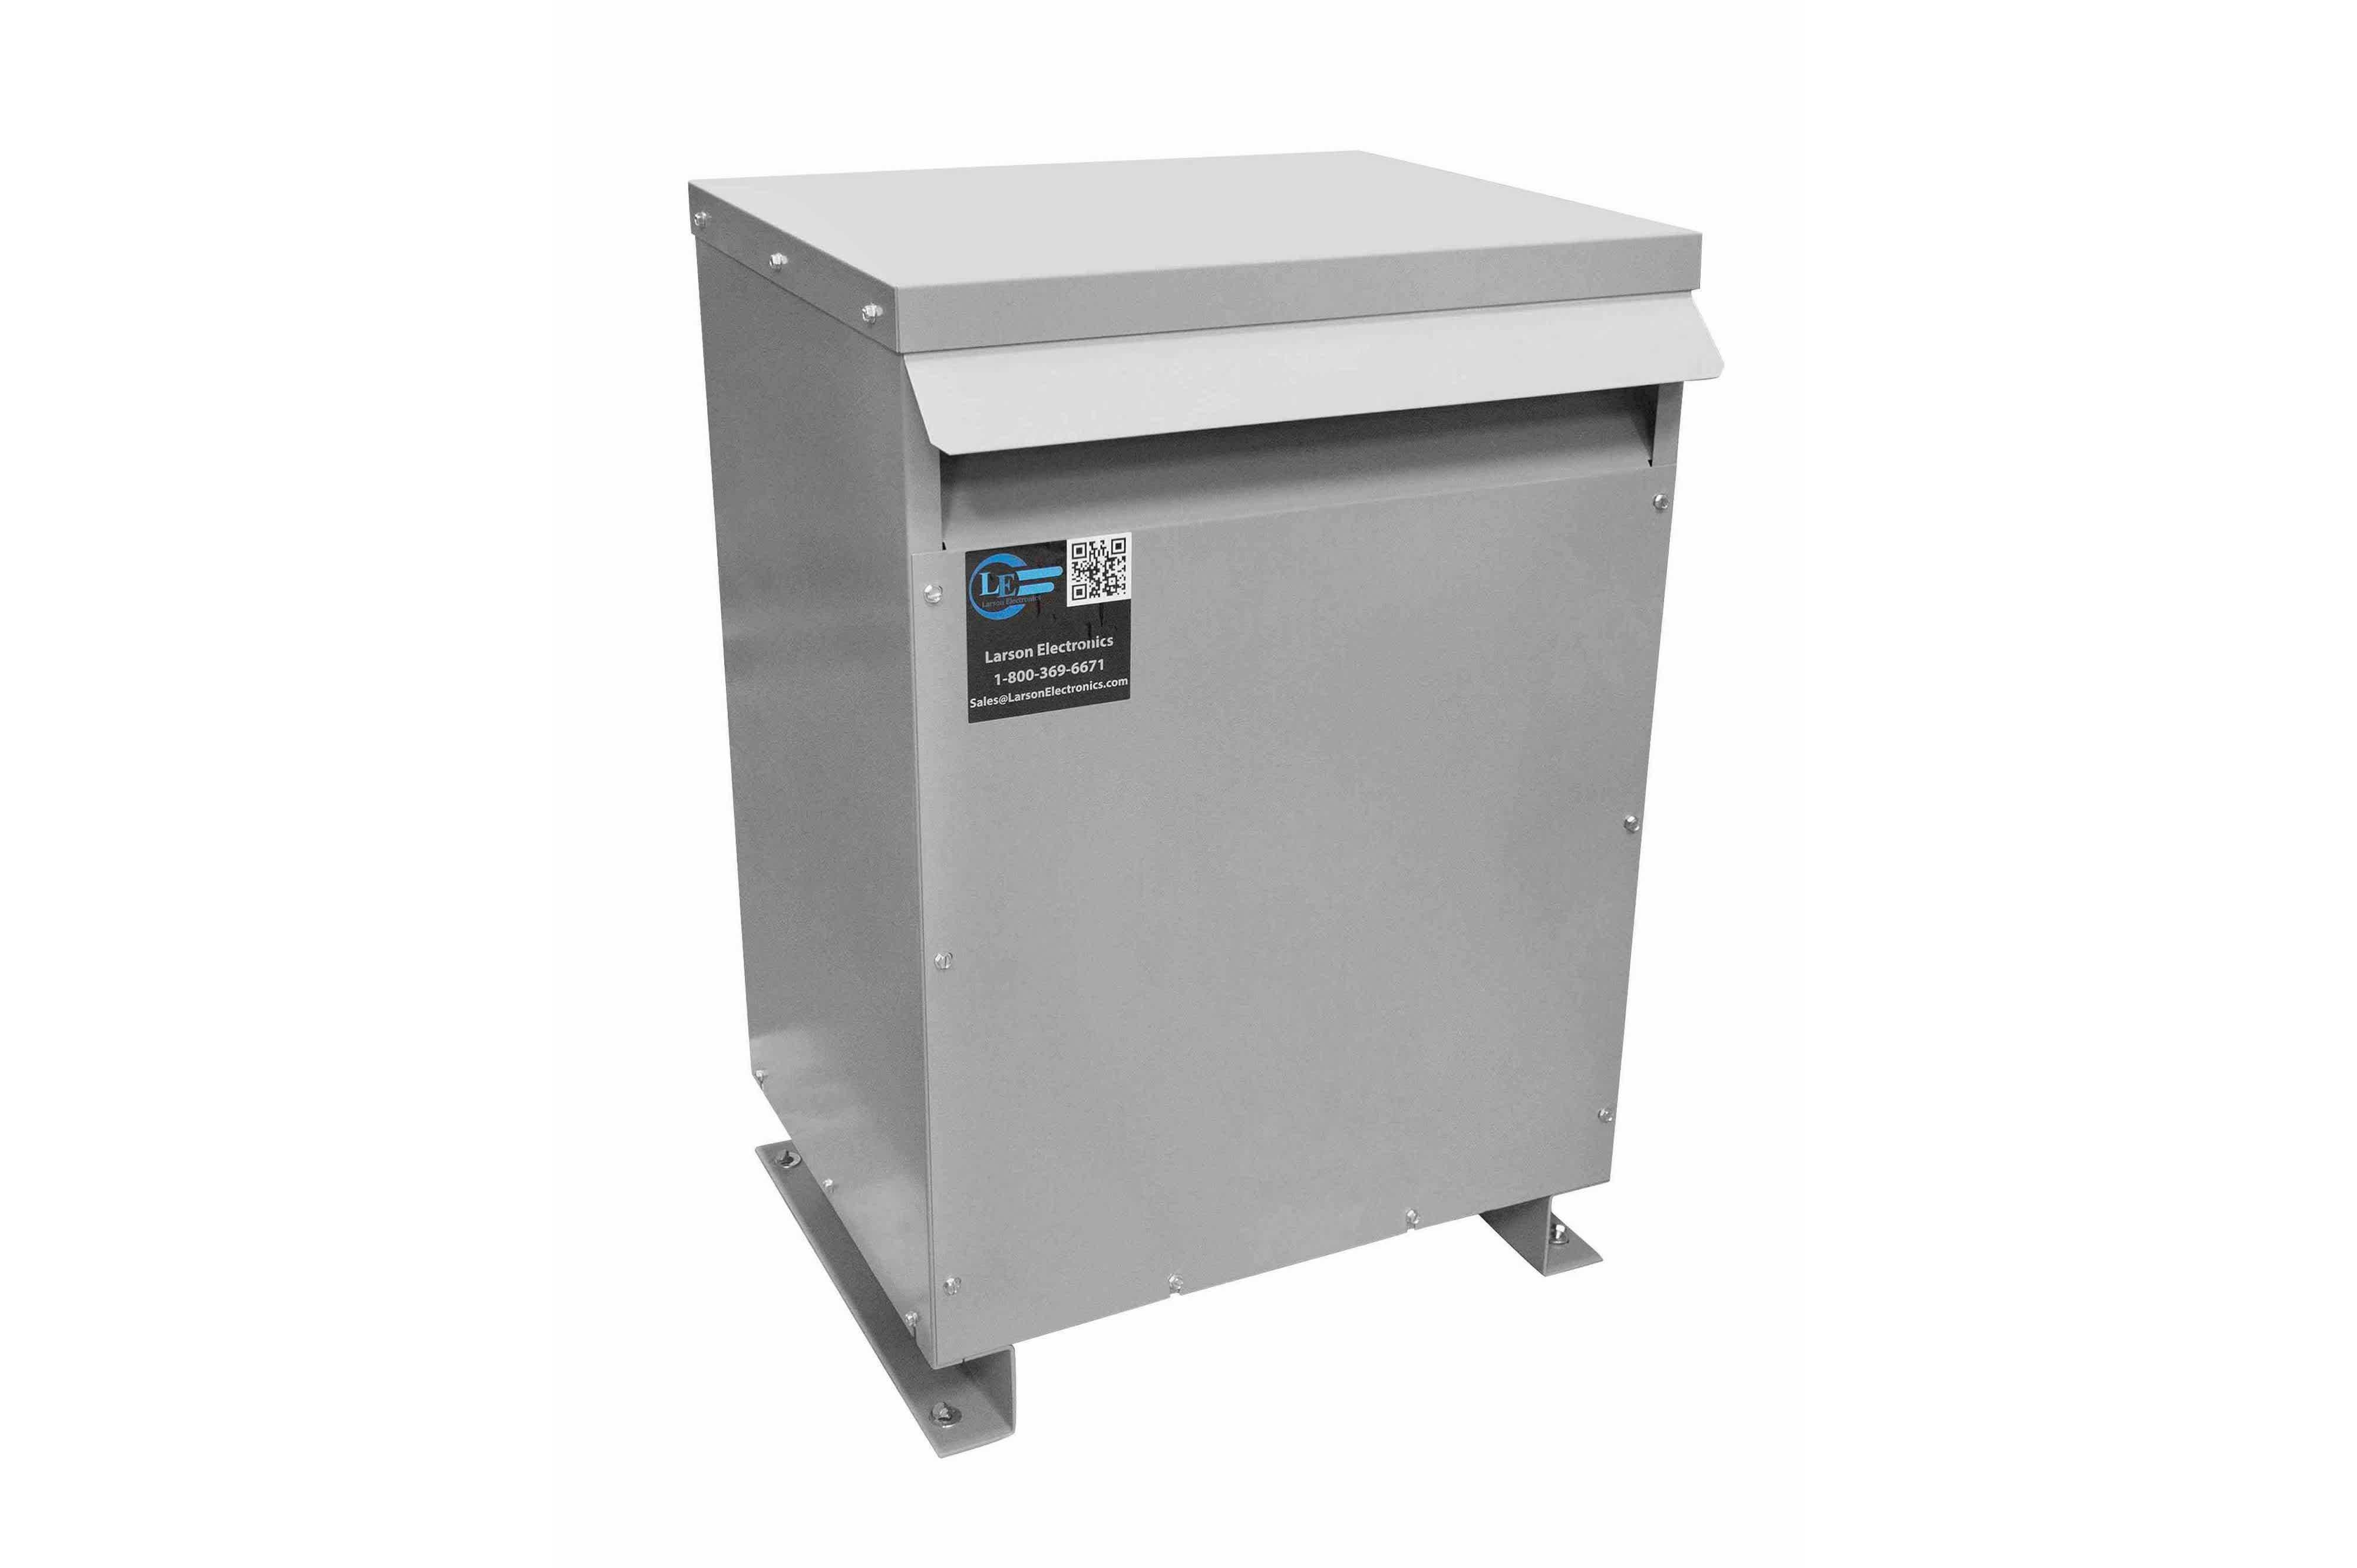 40 kVA 3PH Isolation Transformer, 240V Wye Primary, 380Y/220 Wye-N Secondary, N3R, Ventilated, 60 Hz